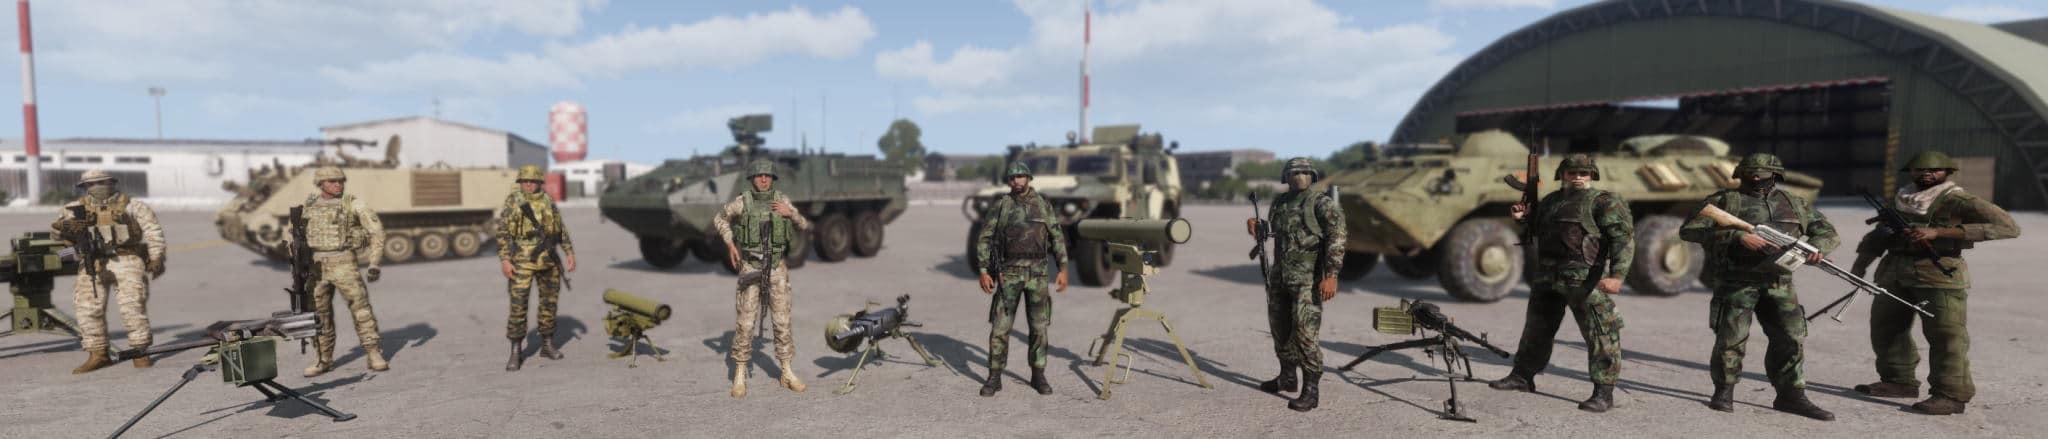 Infanterie - ArmA 3 - RHS - CUP